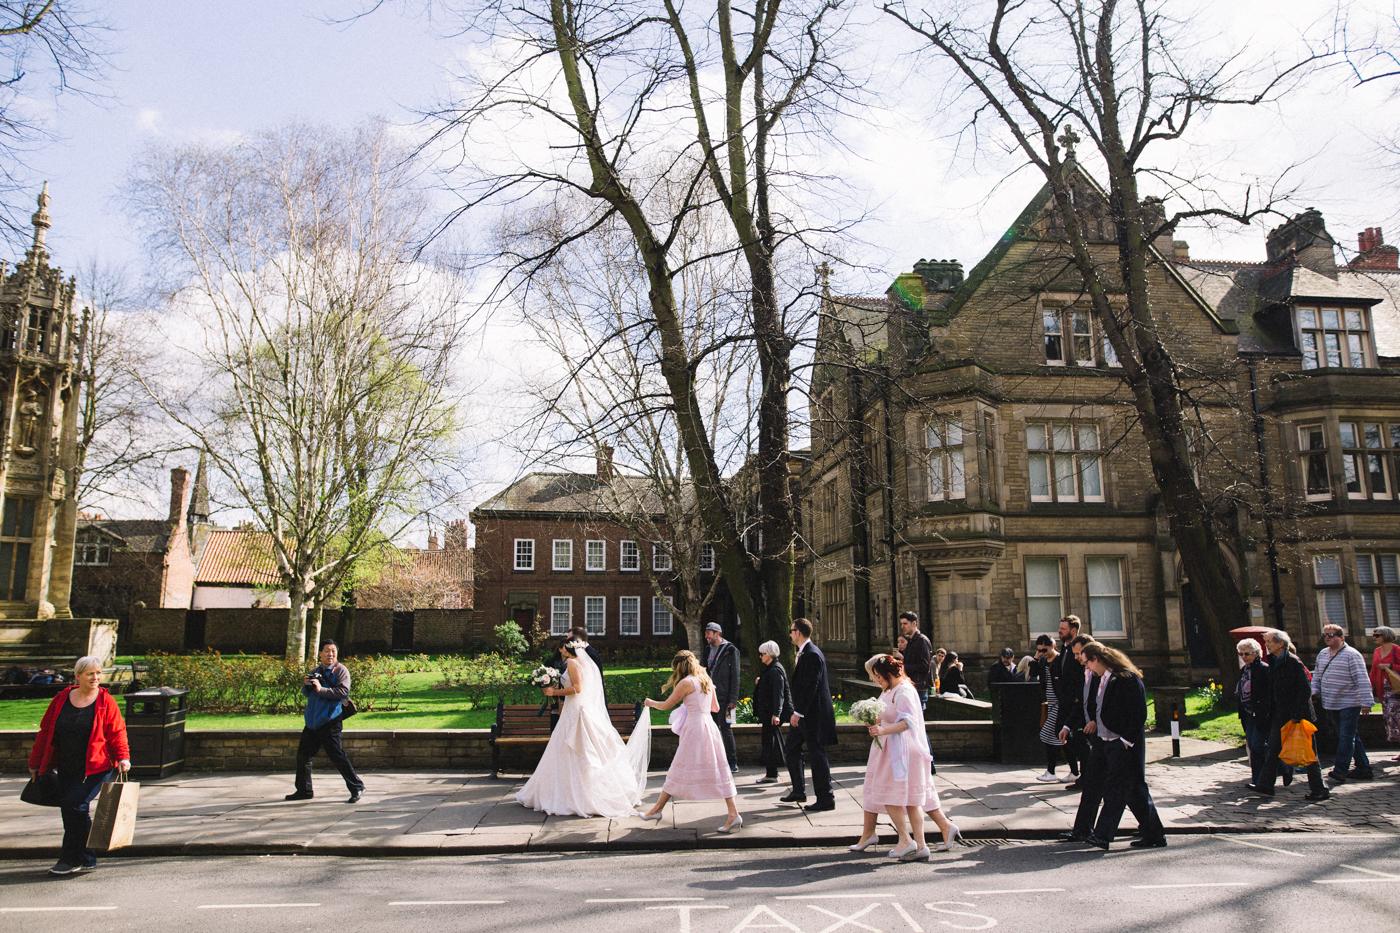 teesside-middlesbrough-north-east-wedding-photographer-creative-wedding-venues-0046.jpg